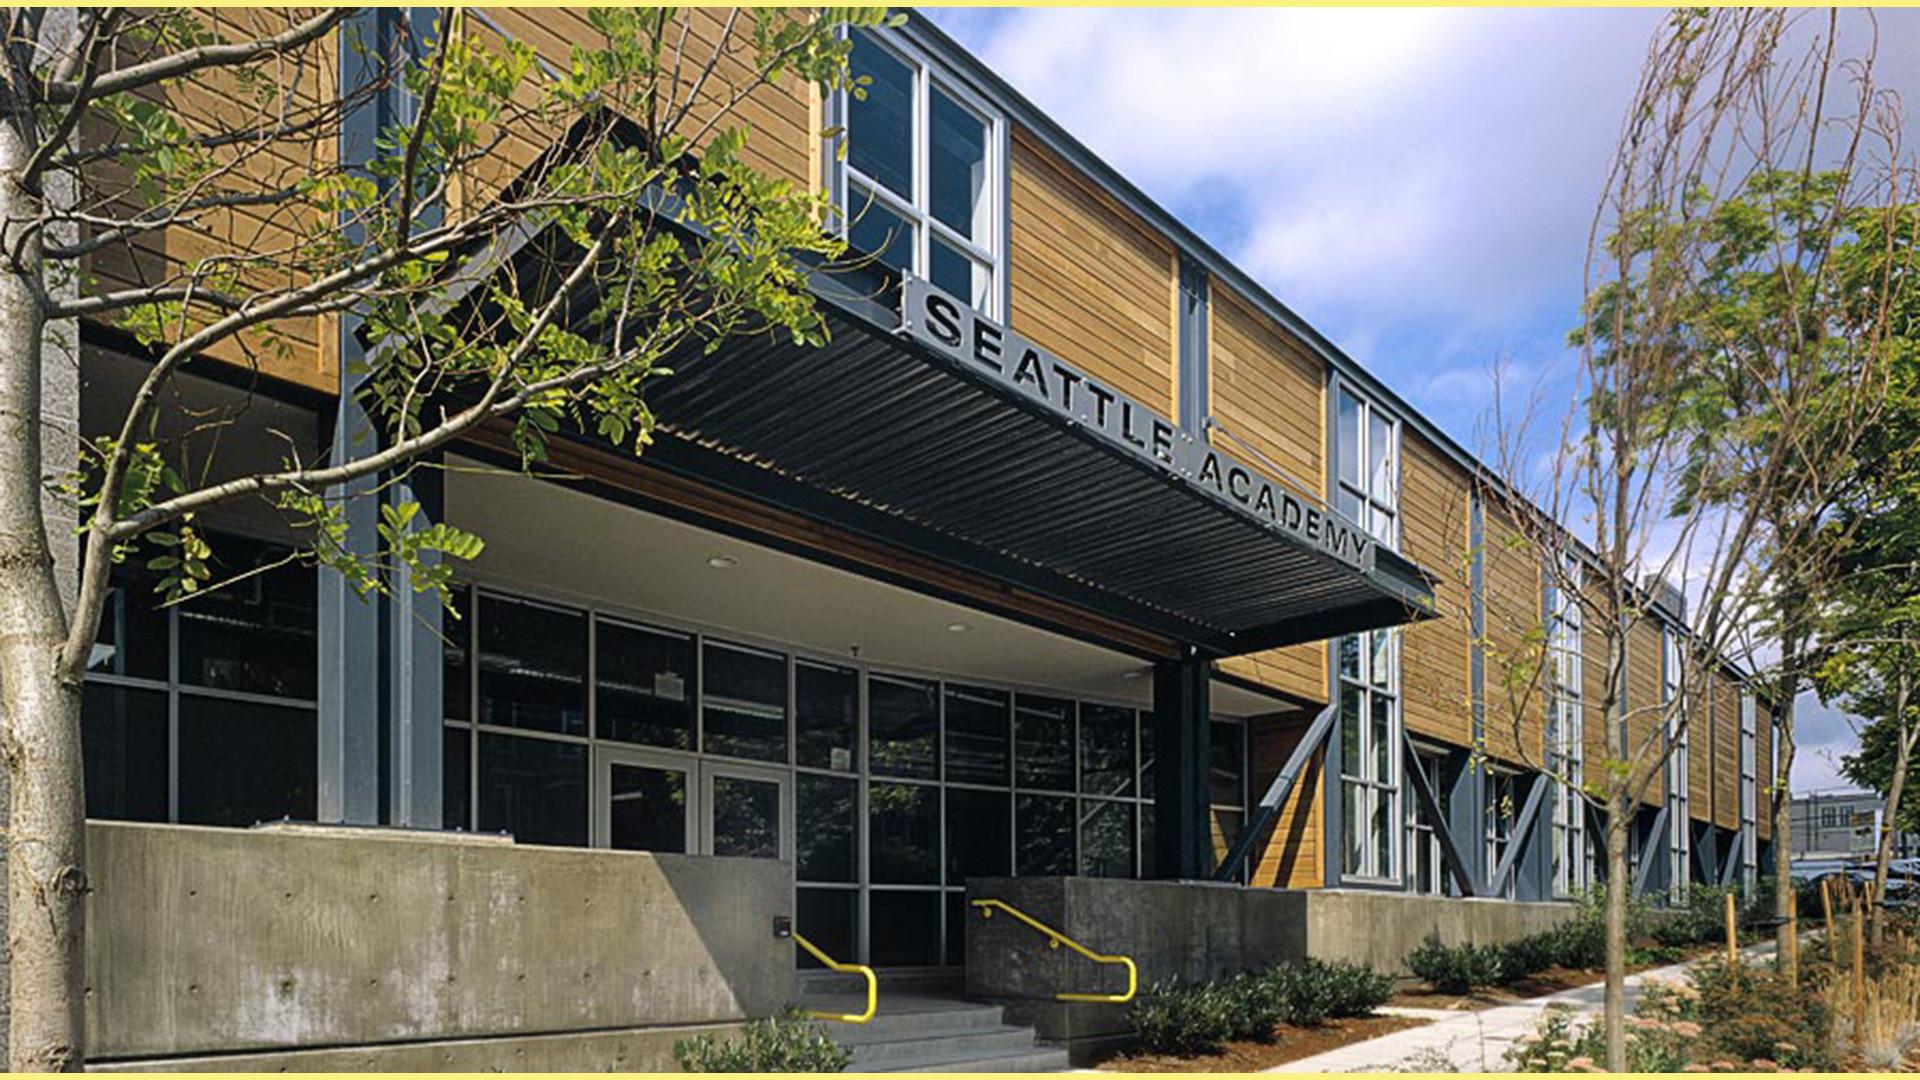 Seattle Academy Gymnasium Swenson Say Fag 233 T